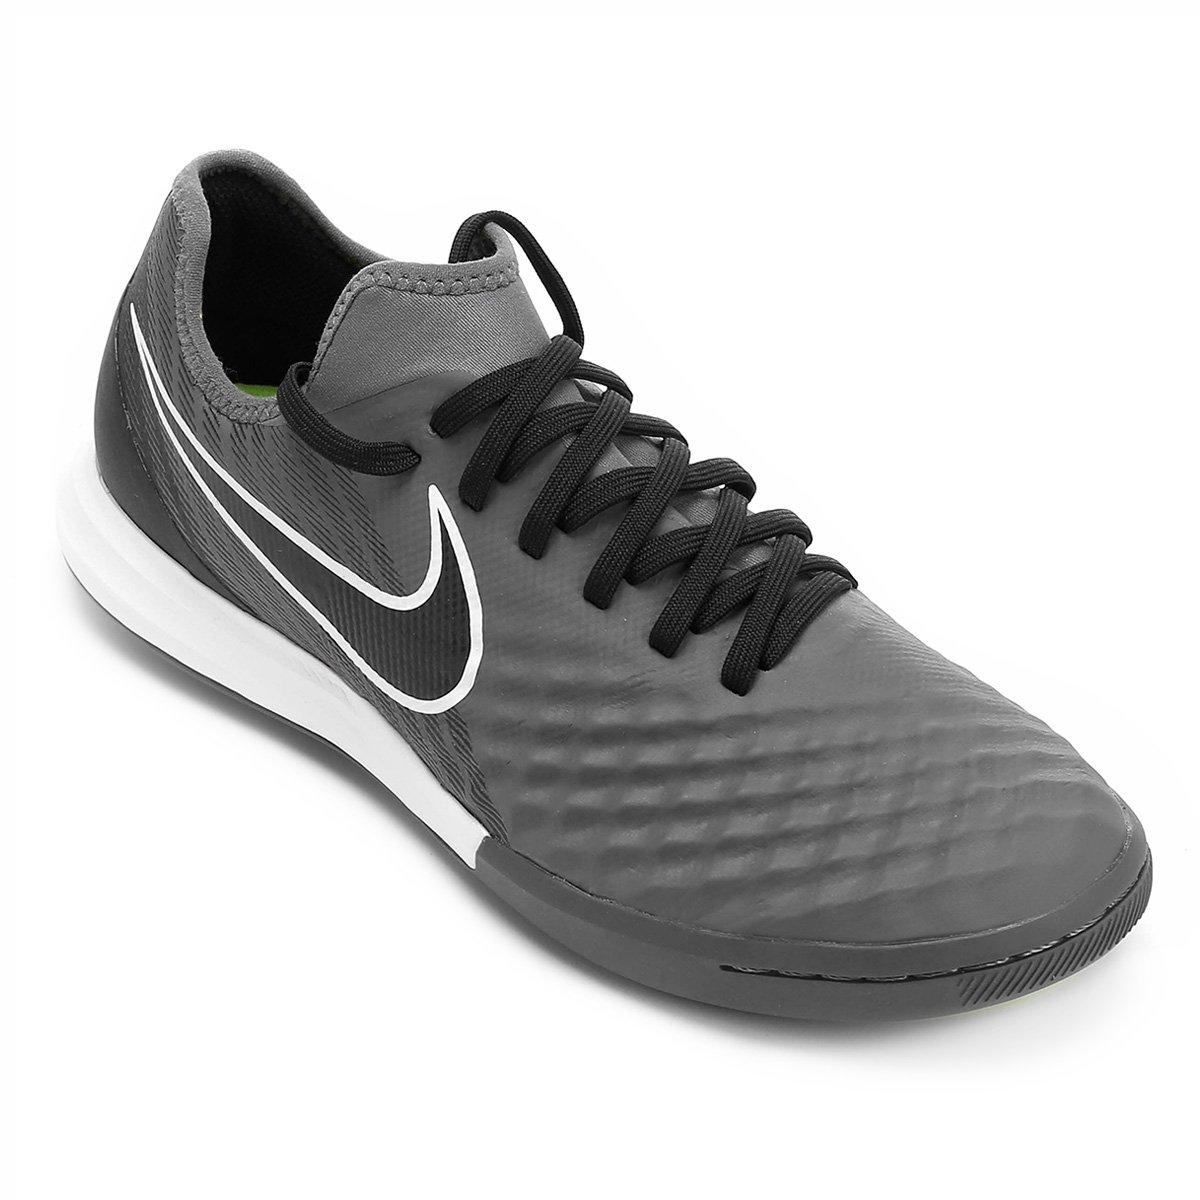 48261aada7 Chuteira Futsal Nike Magista Finale 2 IC - Compre Agora